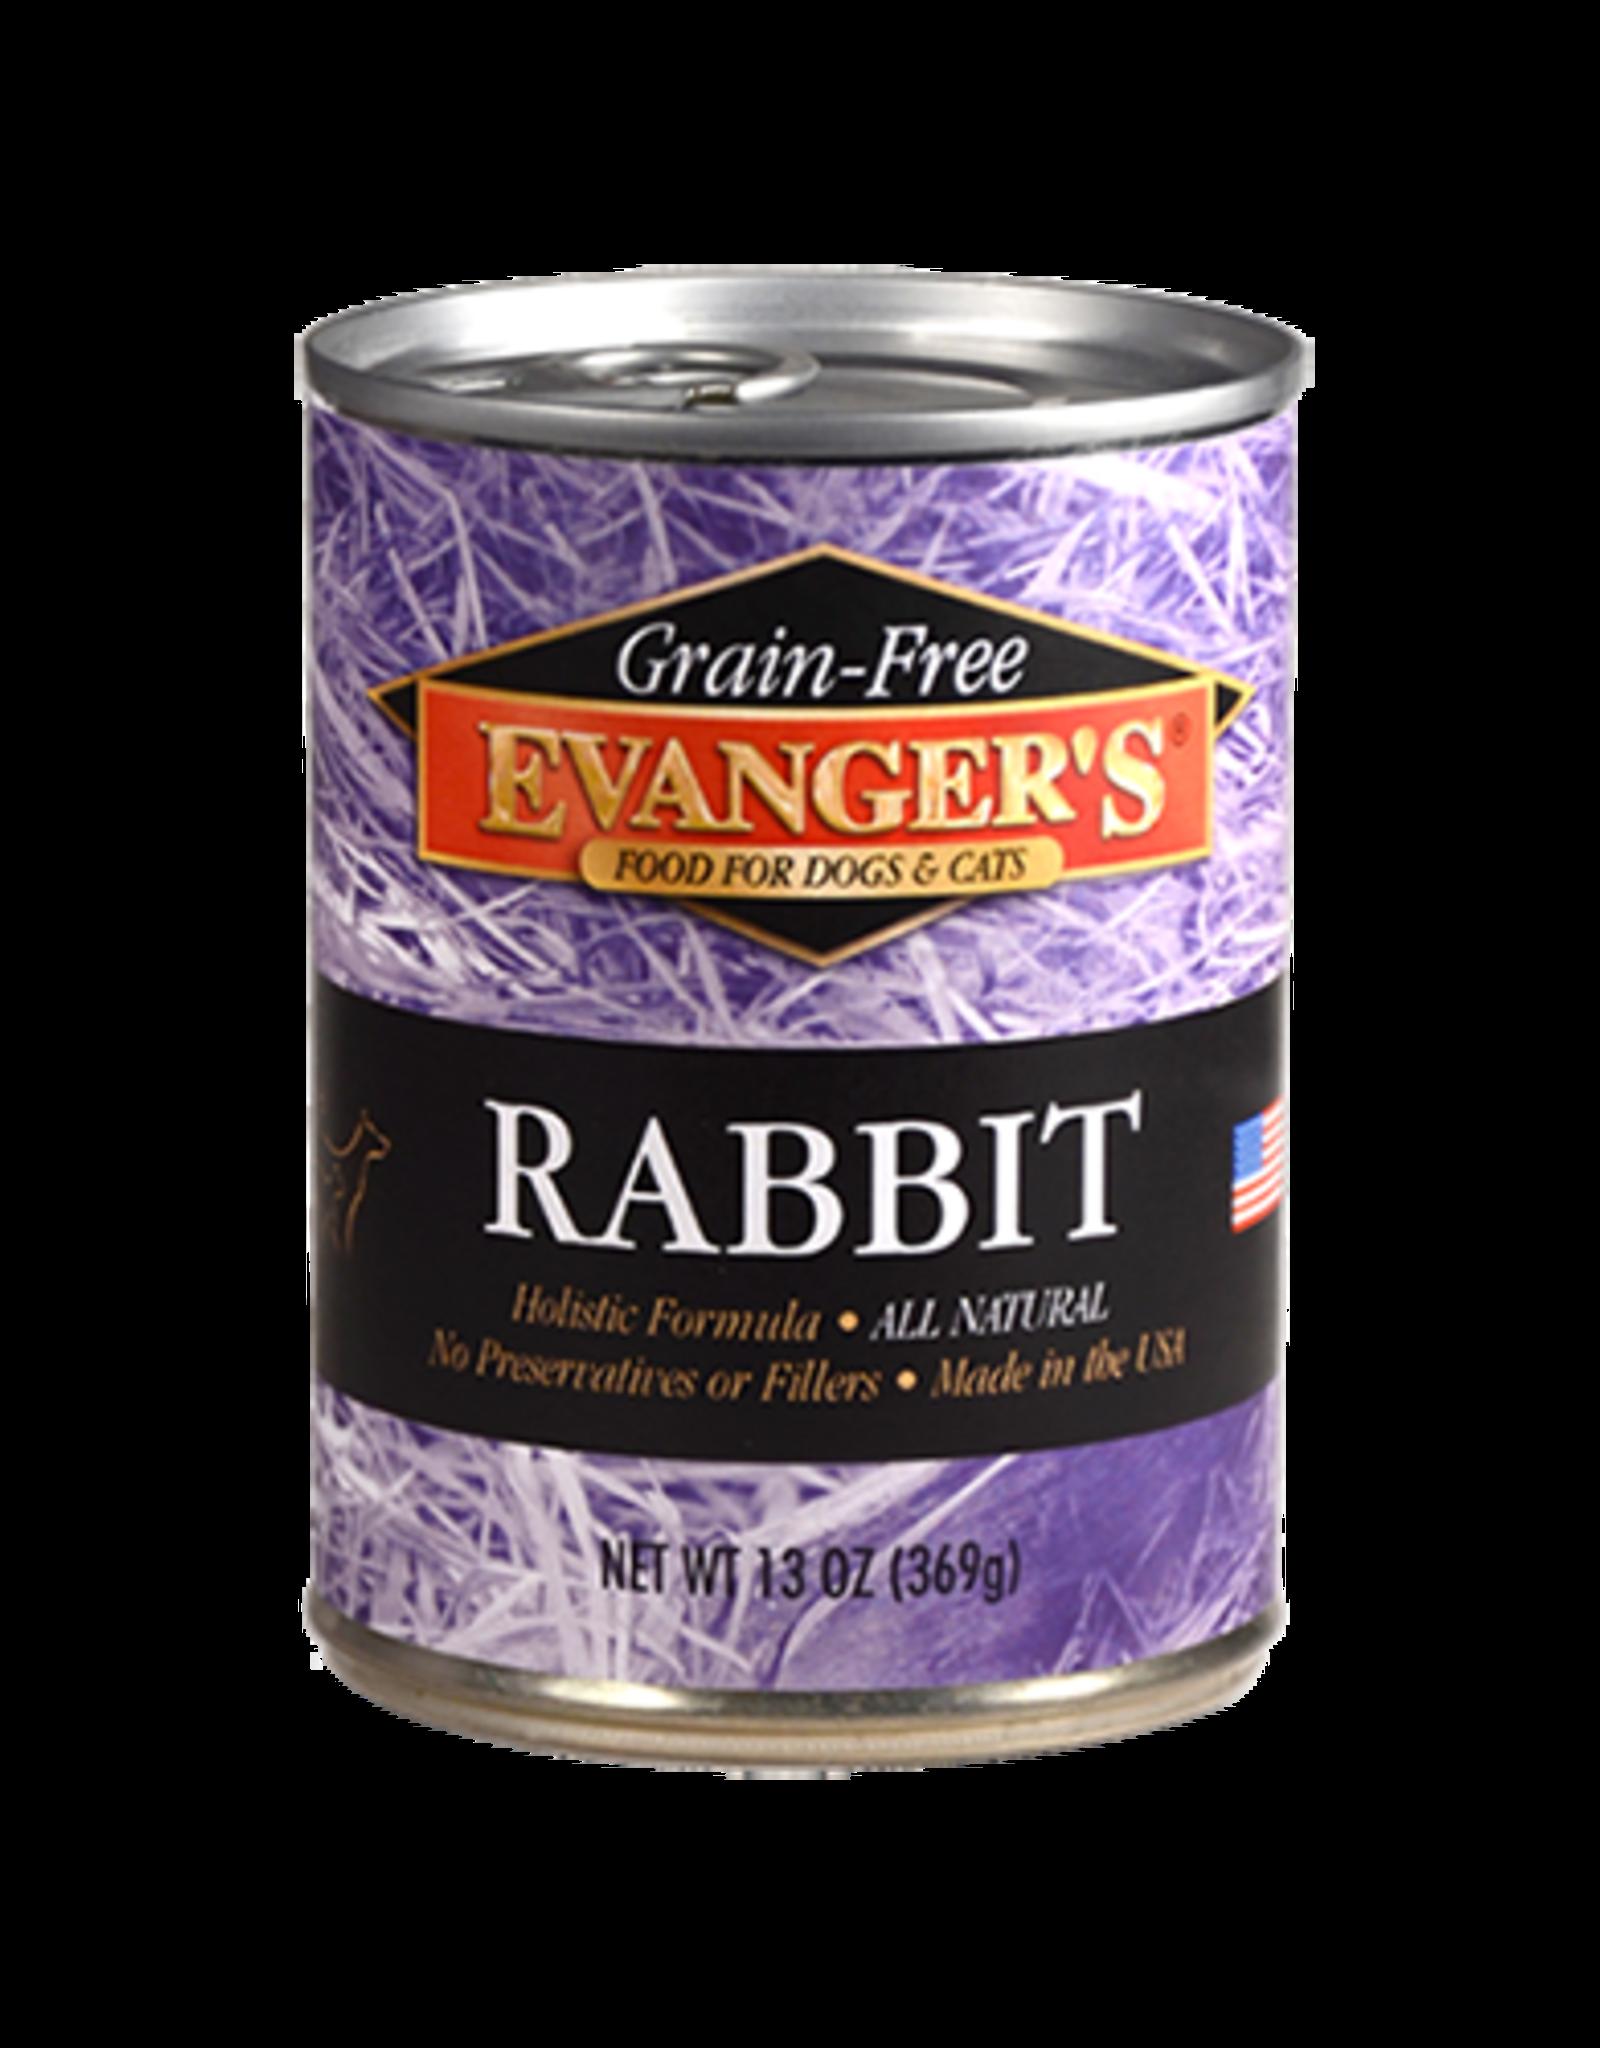 EVANGER'S EVANGERS RABBIT 13OZ CAN